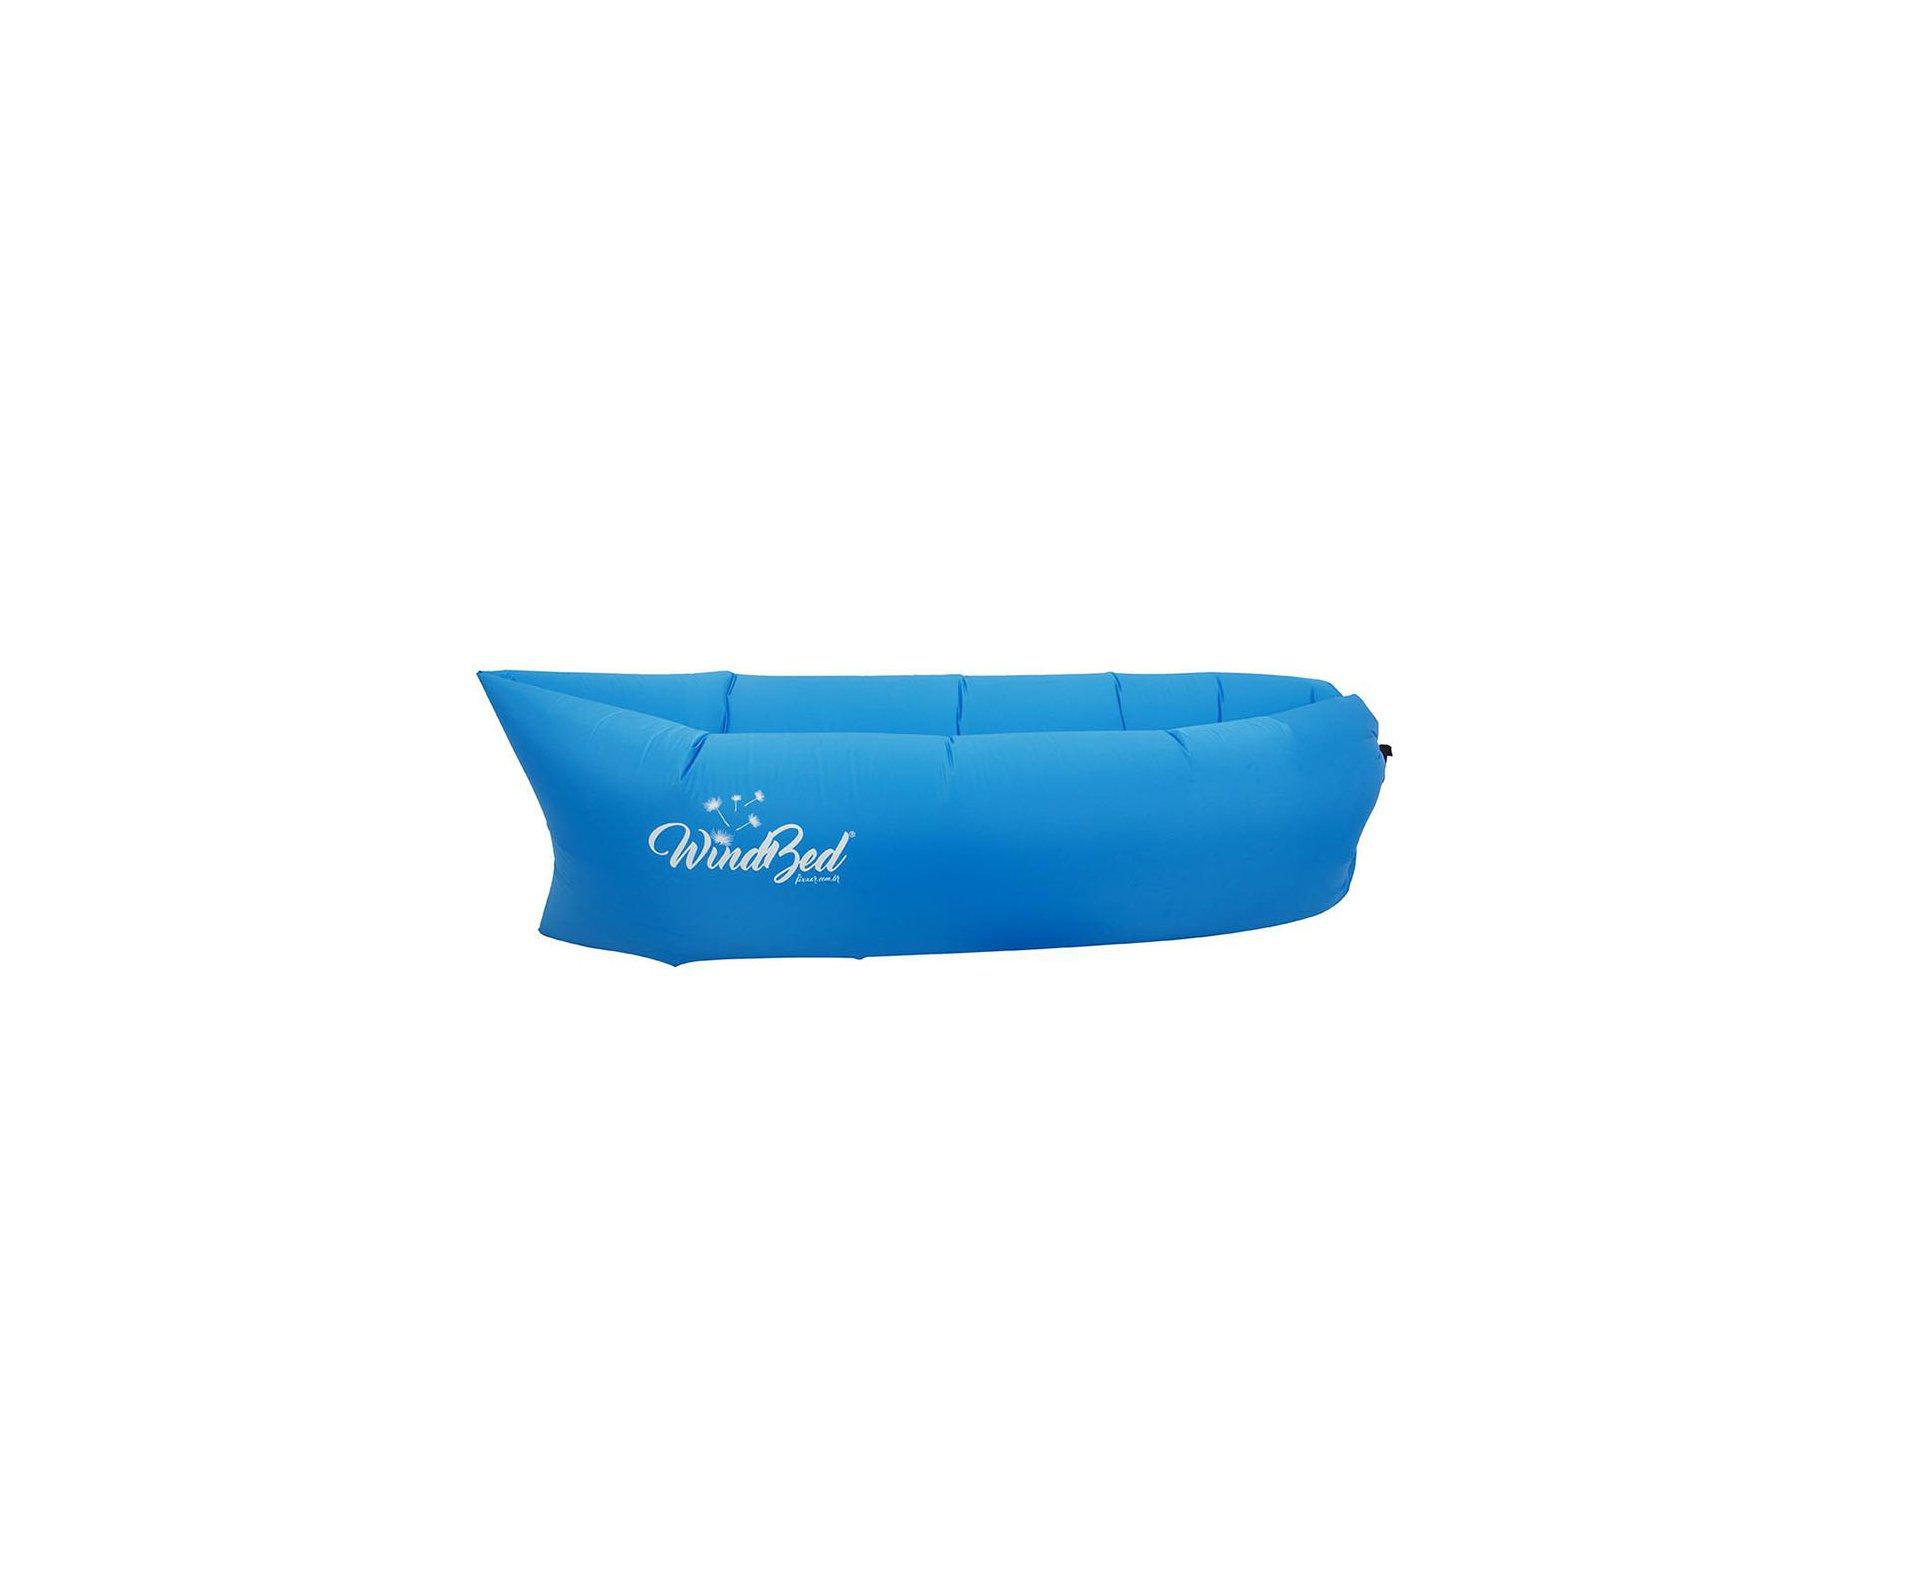 Windbed Sofá Inflável Azul - Fixxar